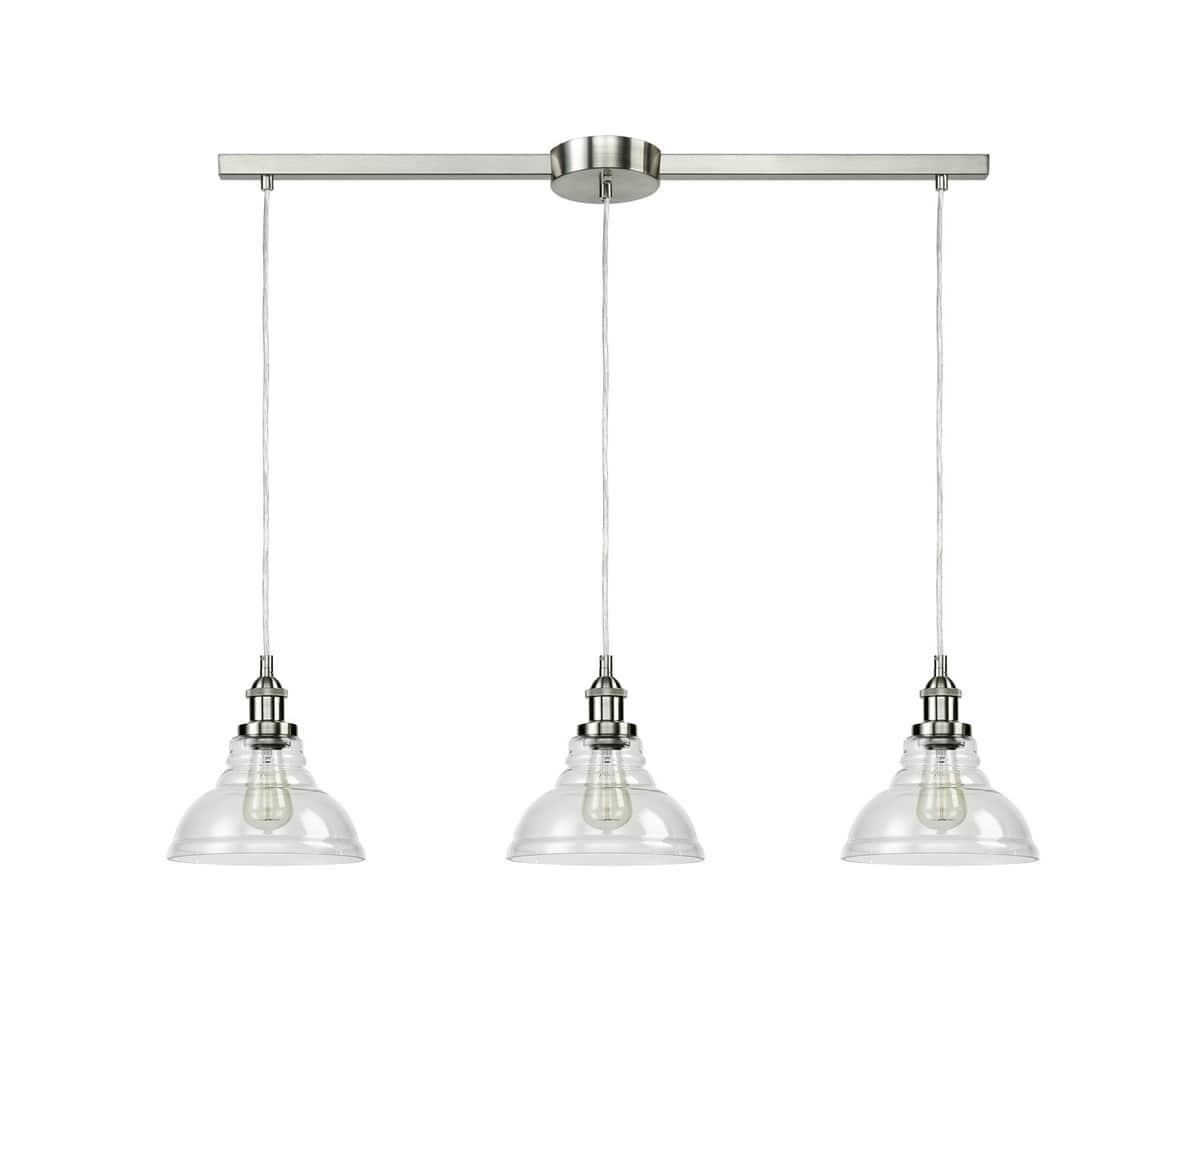 Industrial Kitchen Island Pendant Lights Barn Shape Brushed Nickel Finish